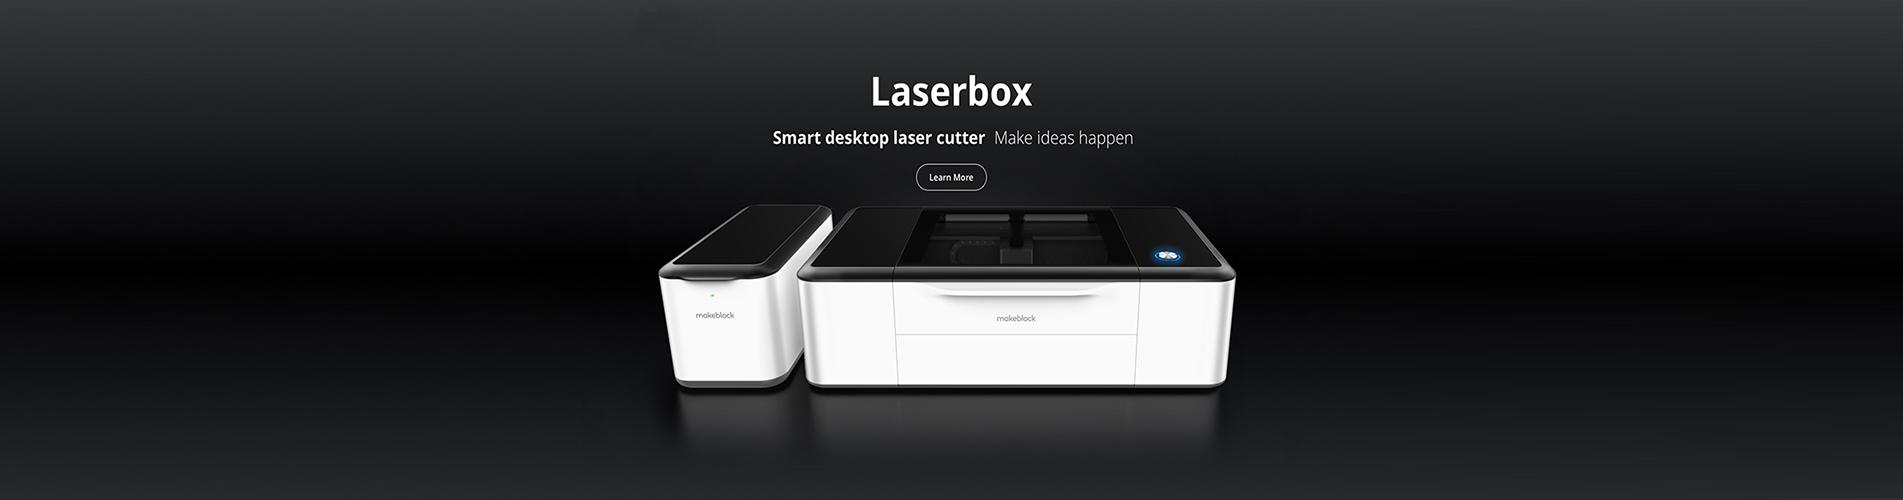 banner_laserbox_pc_en